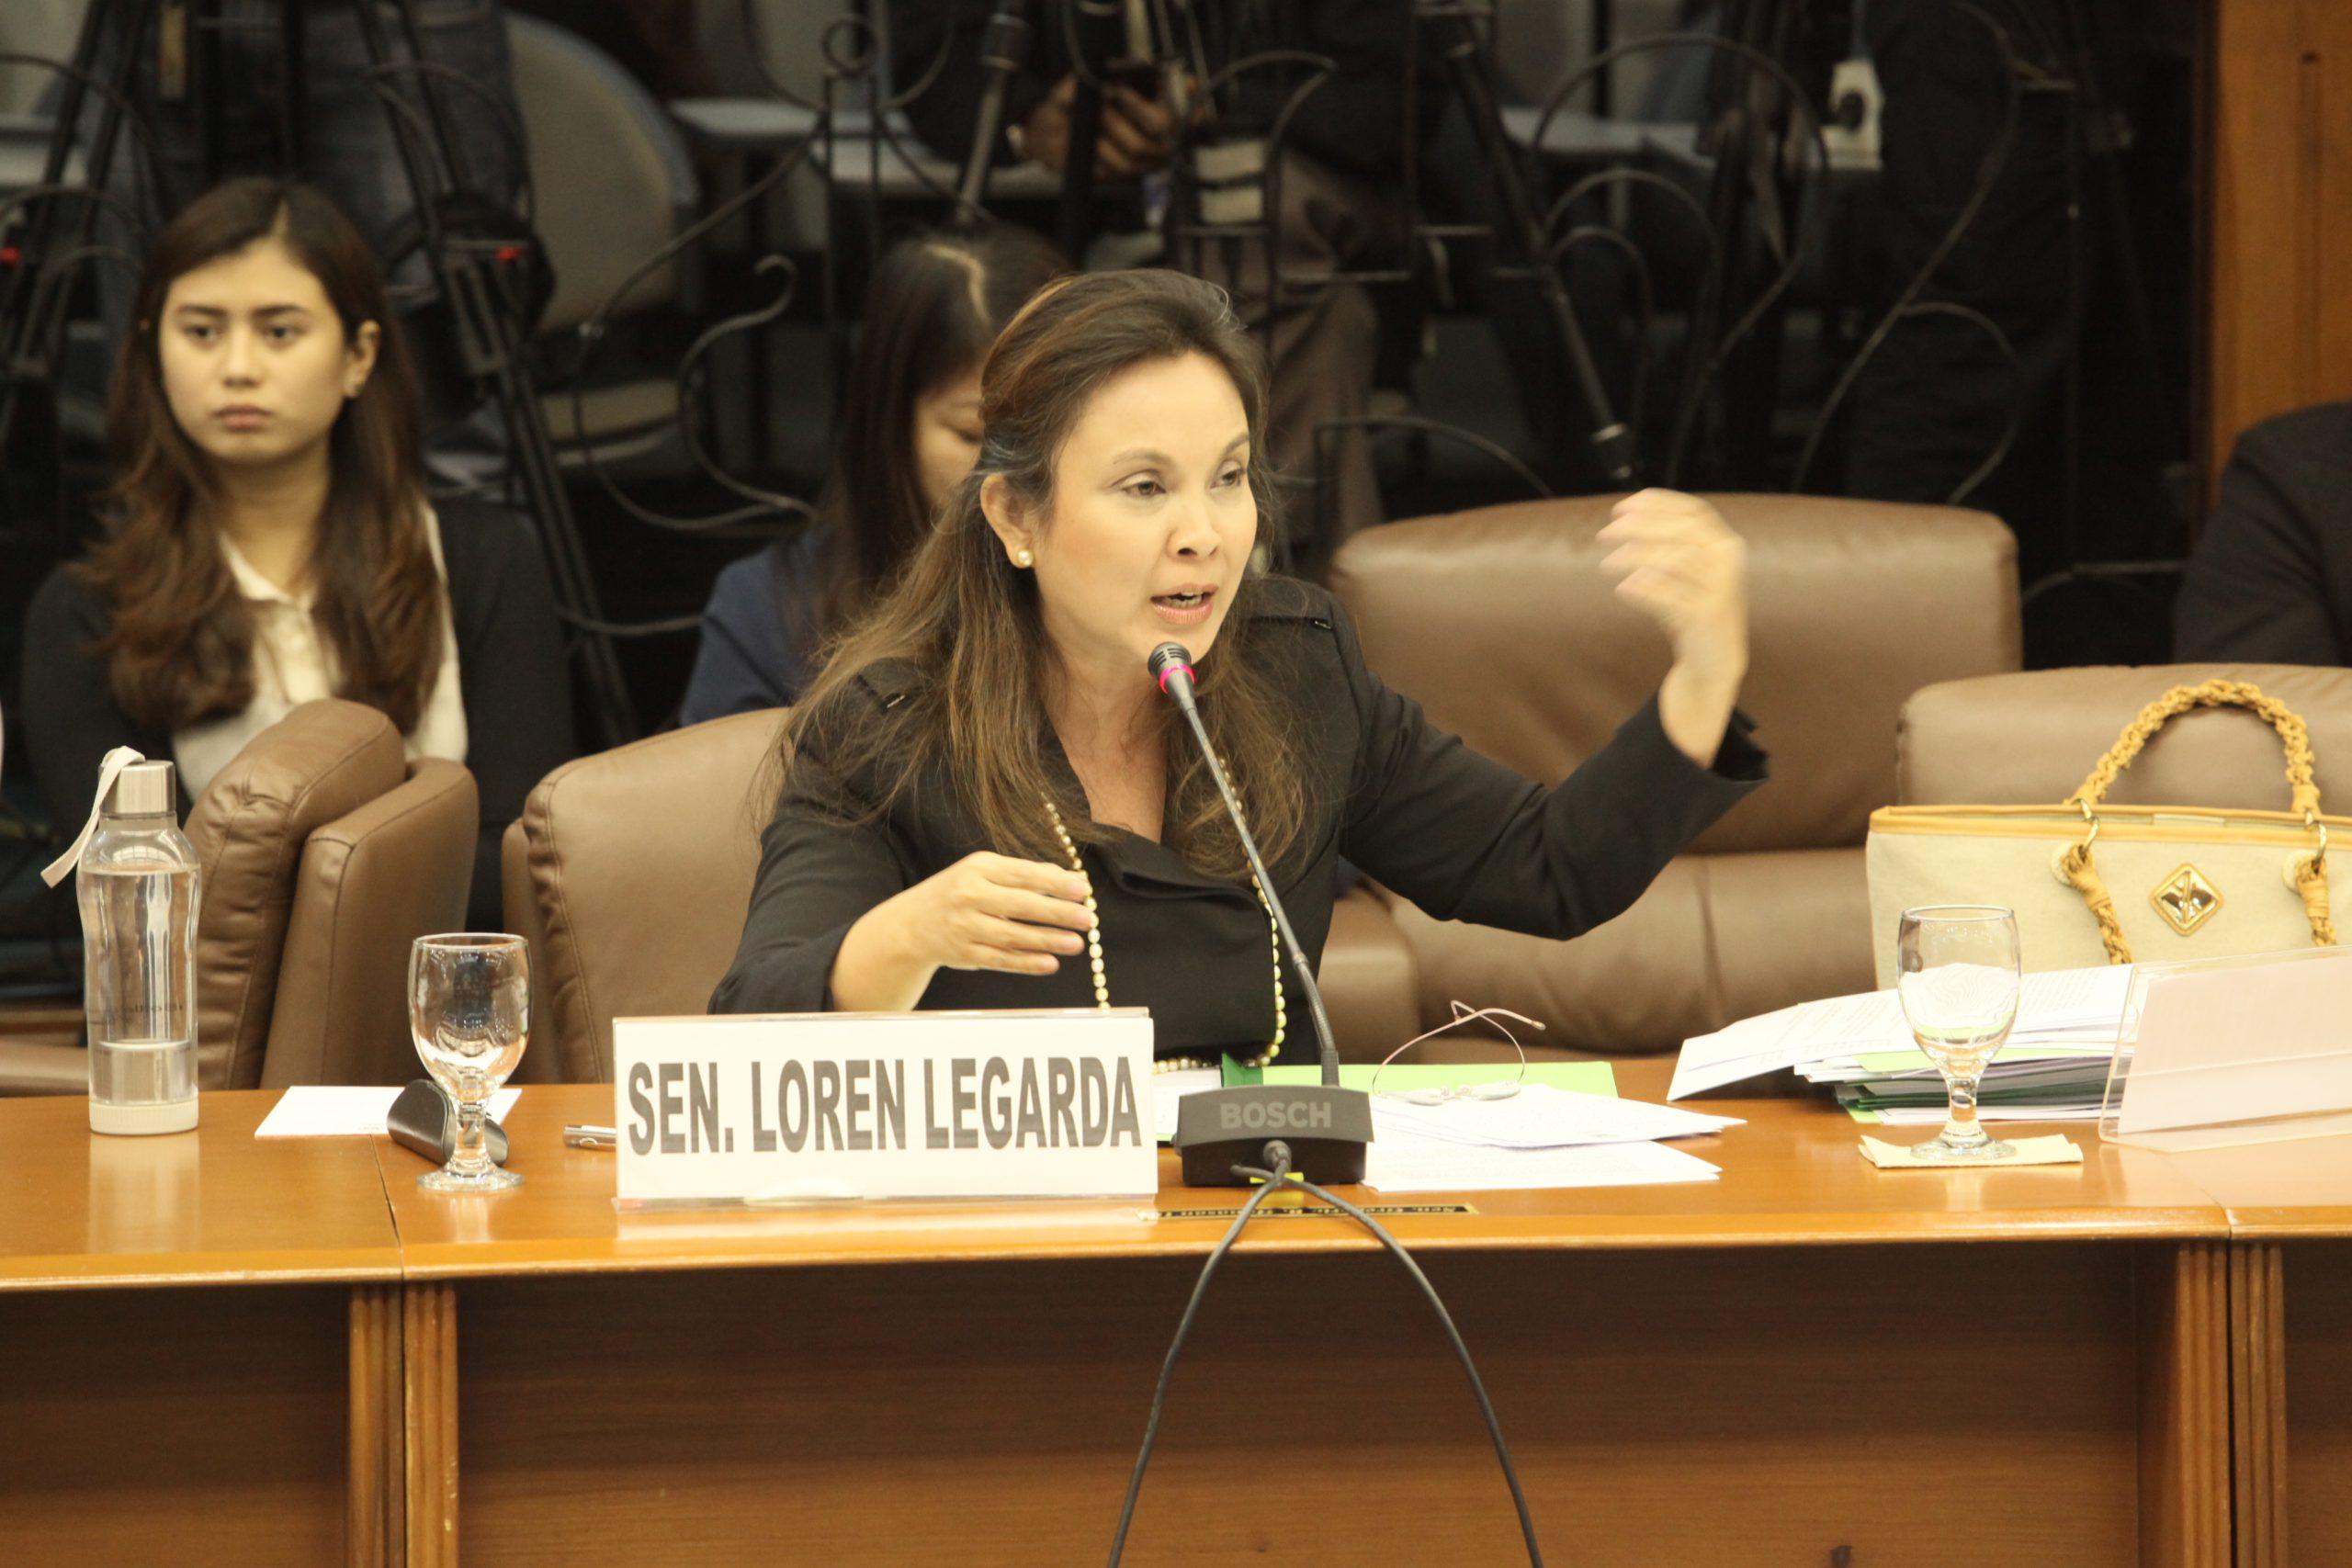 Senate Inquiry on the Mamasapano Incident